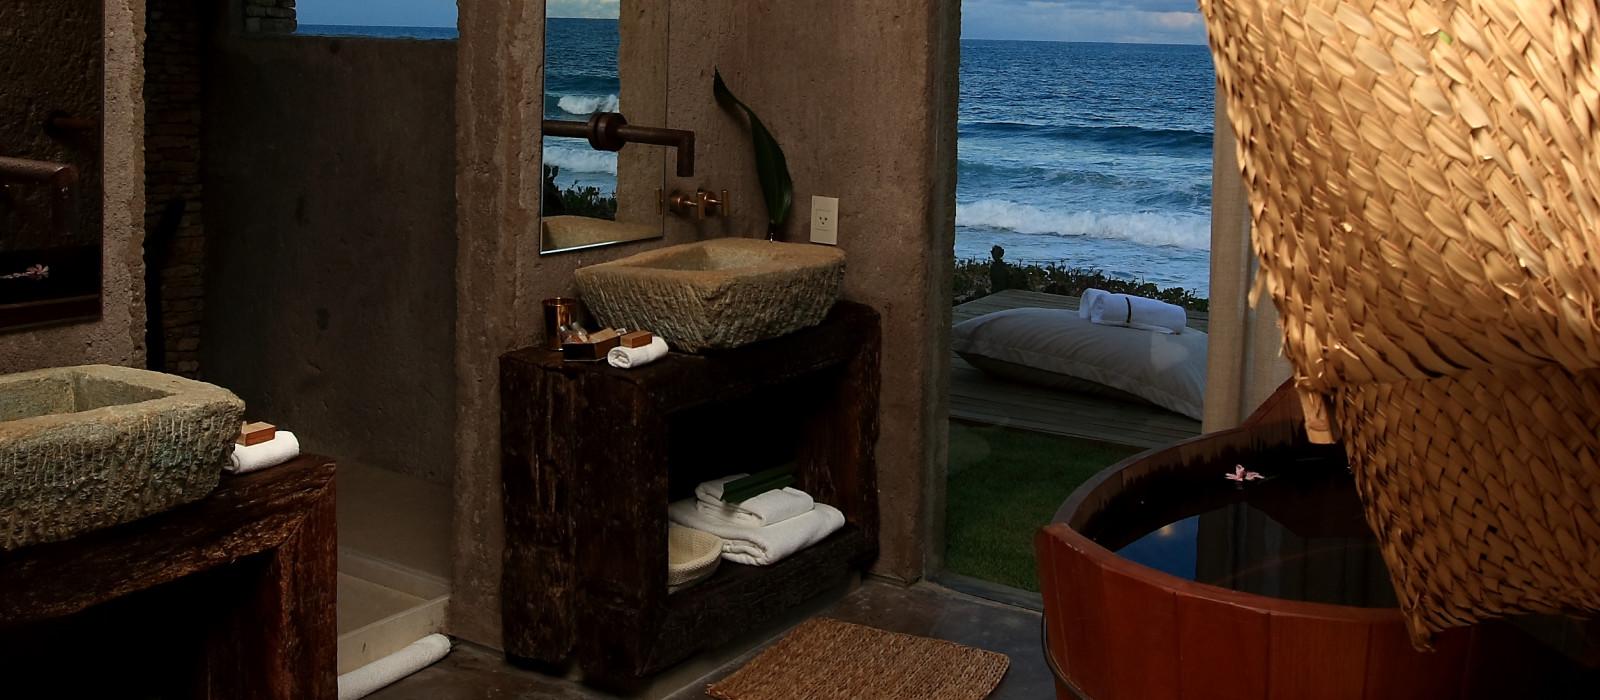 Hotel Kenoa – Exclusive Beach Resort & Spa Brazil